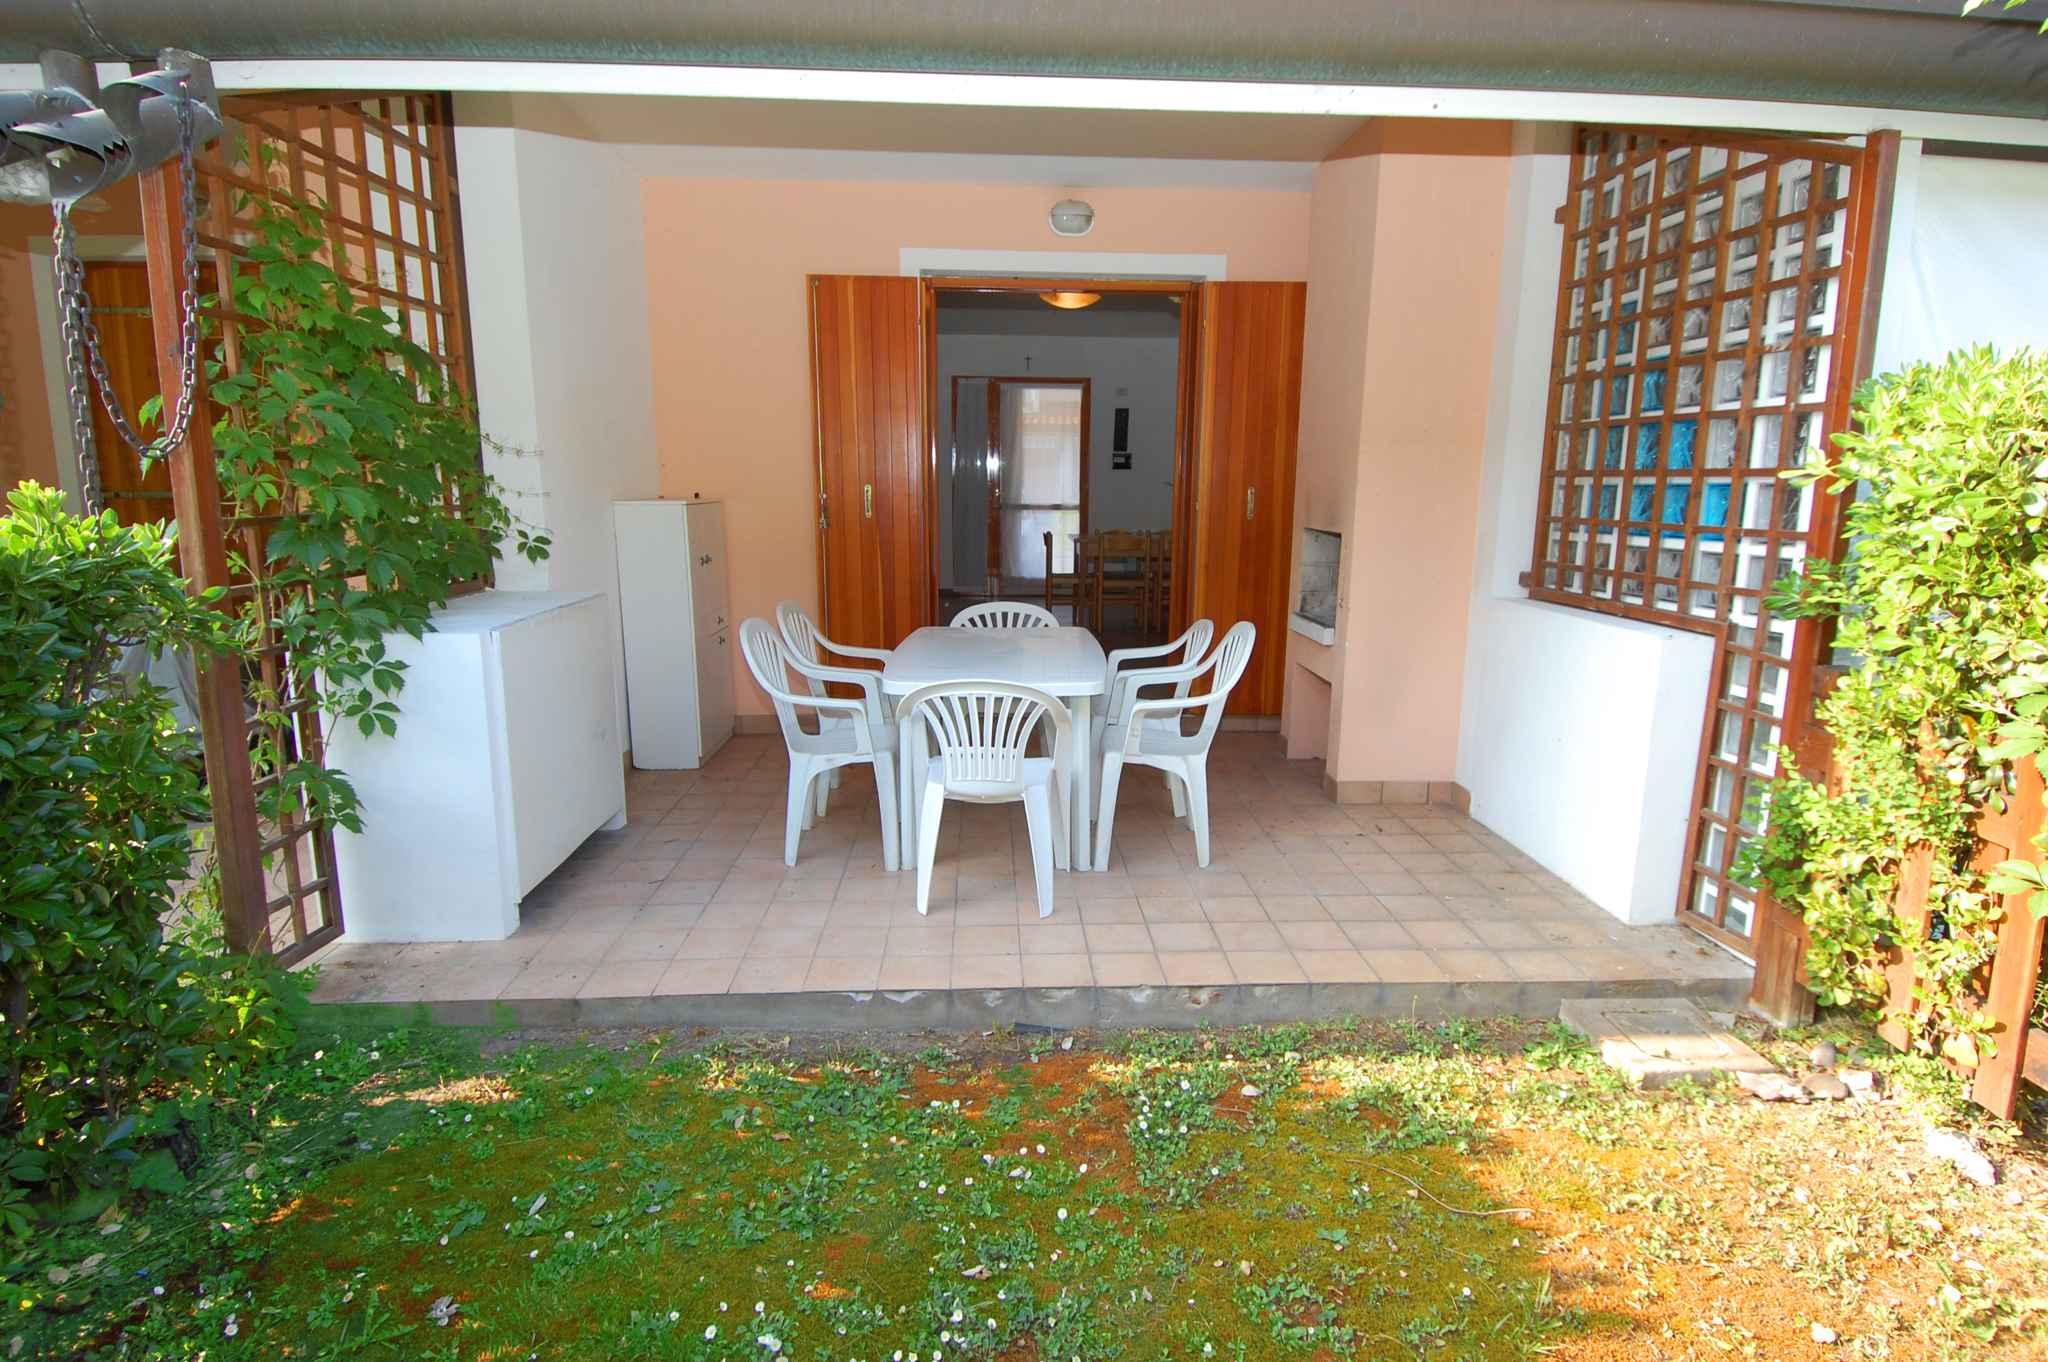 Ferienhaus mit Pool und Grill (284304), Rosolina Mare, Rovigo, Venetien, Italien, Bild 5